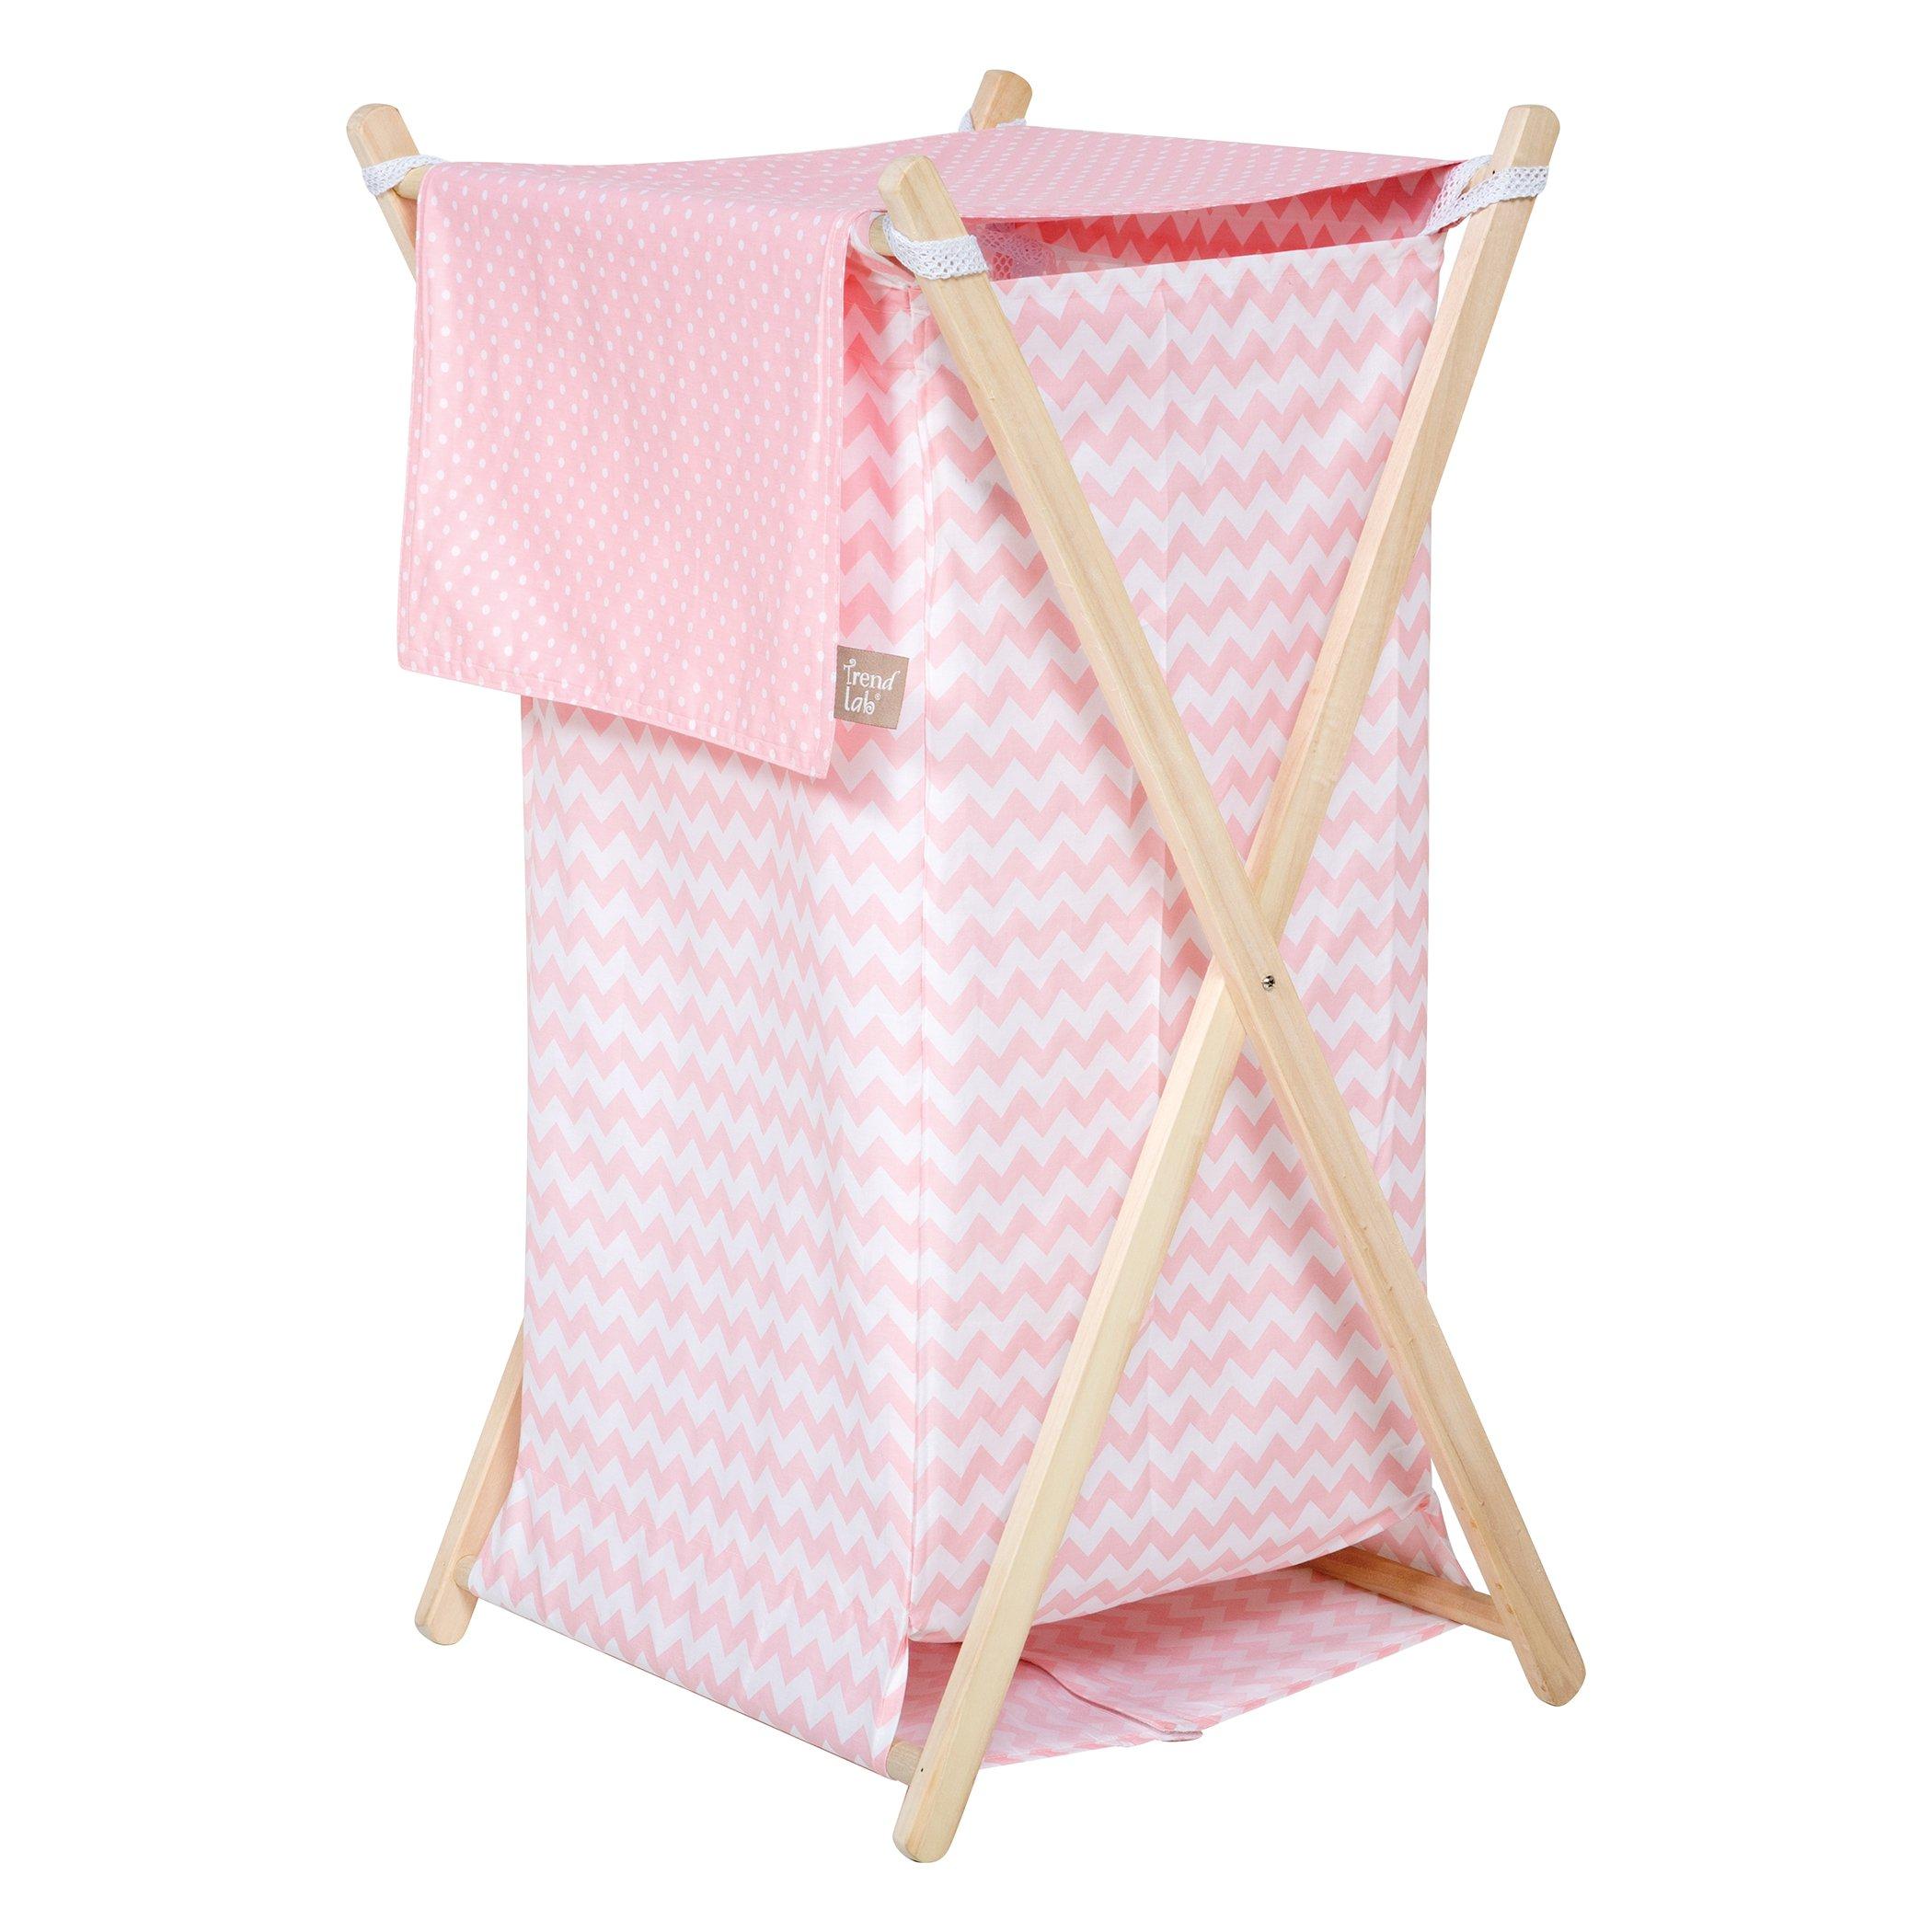 Trend Lab Sky Hamper Set, Pink by Trend Lab